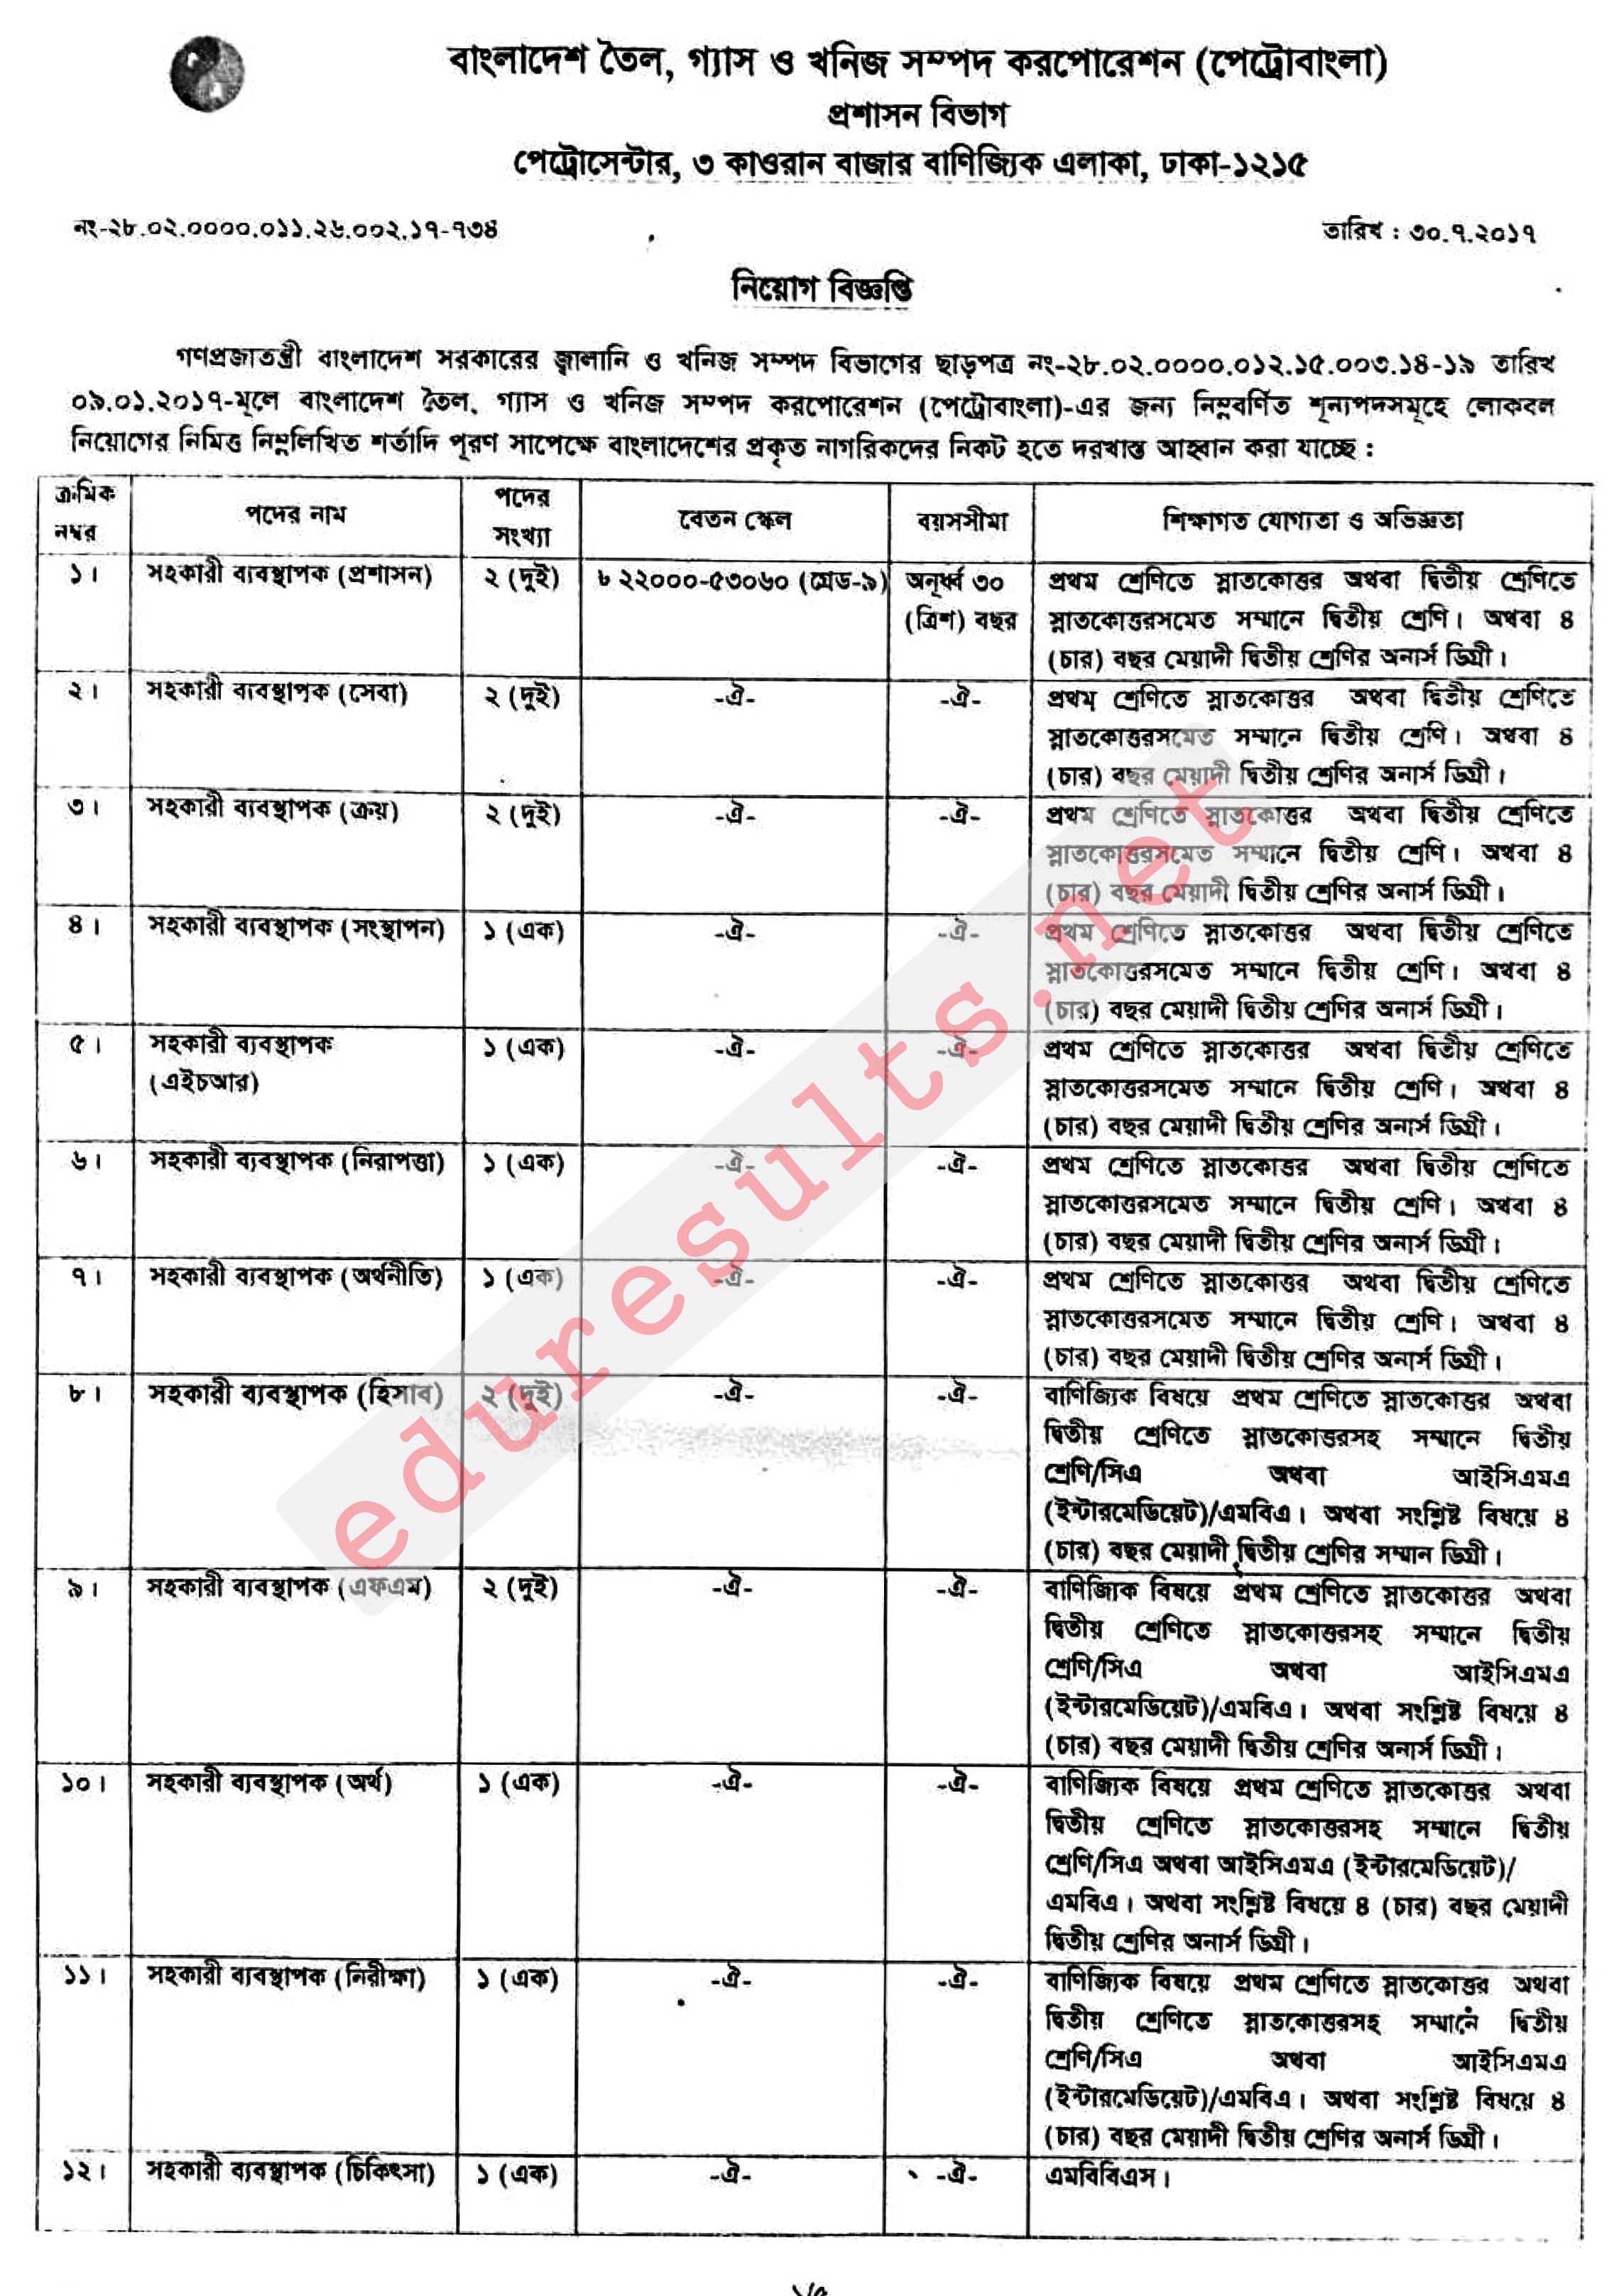 Petrobangla Job Exam Schedule notice 2018